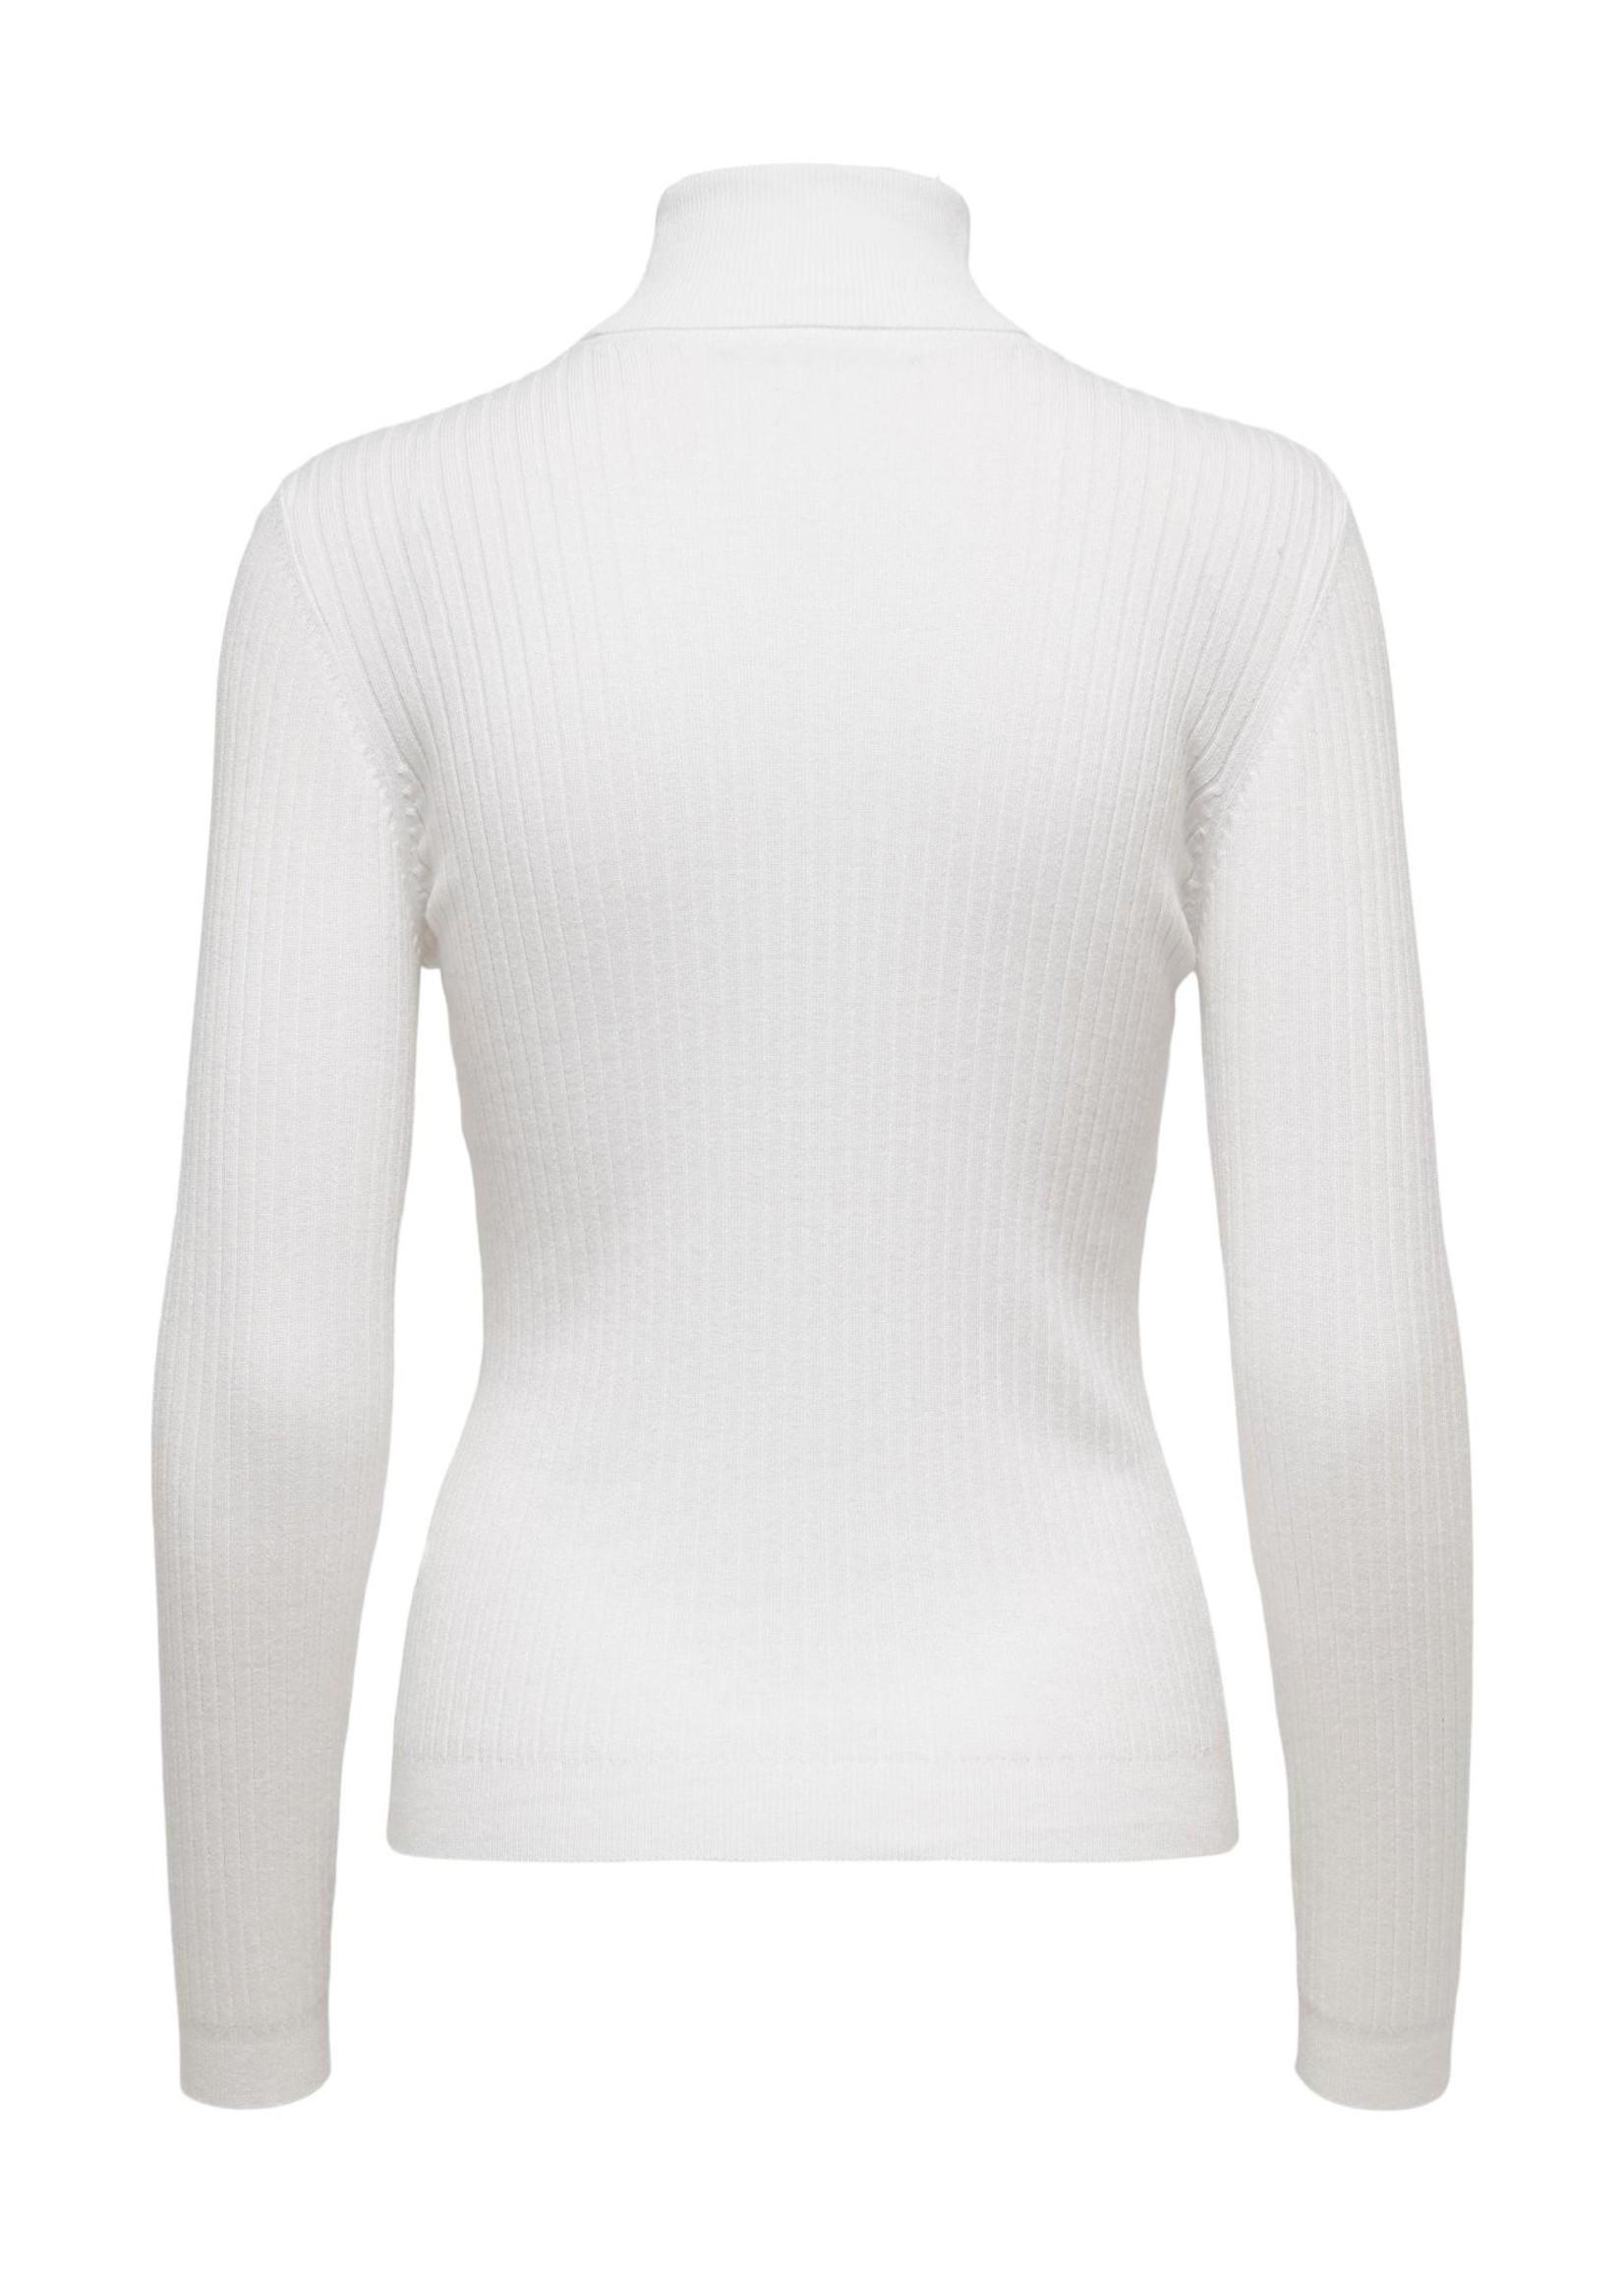 ONLY KAROL L/S ROLLNECK PULLOVER KNT NOOS bright white